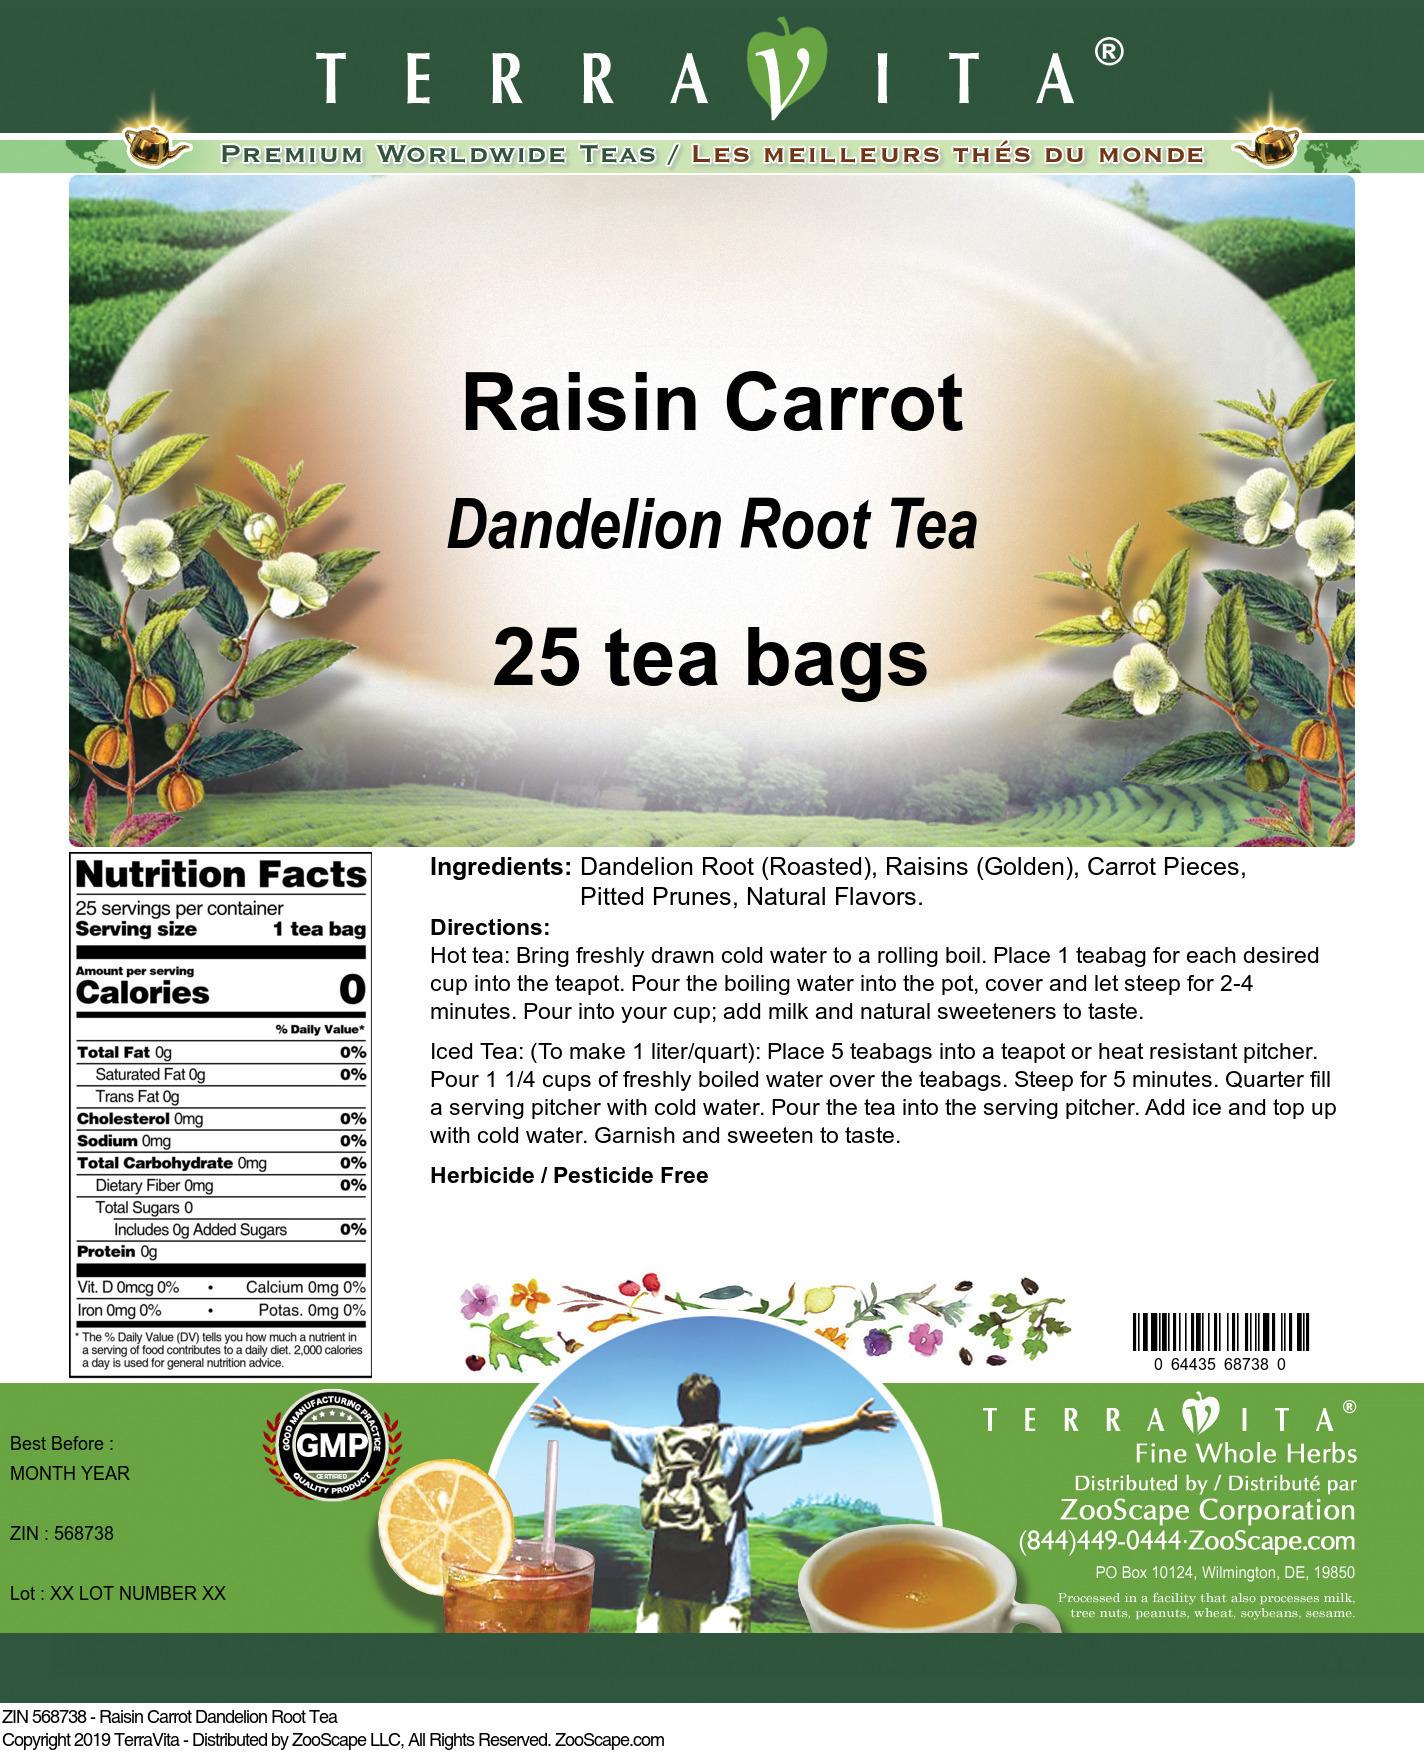 Raisin Carrot Dandelion Root Tea